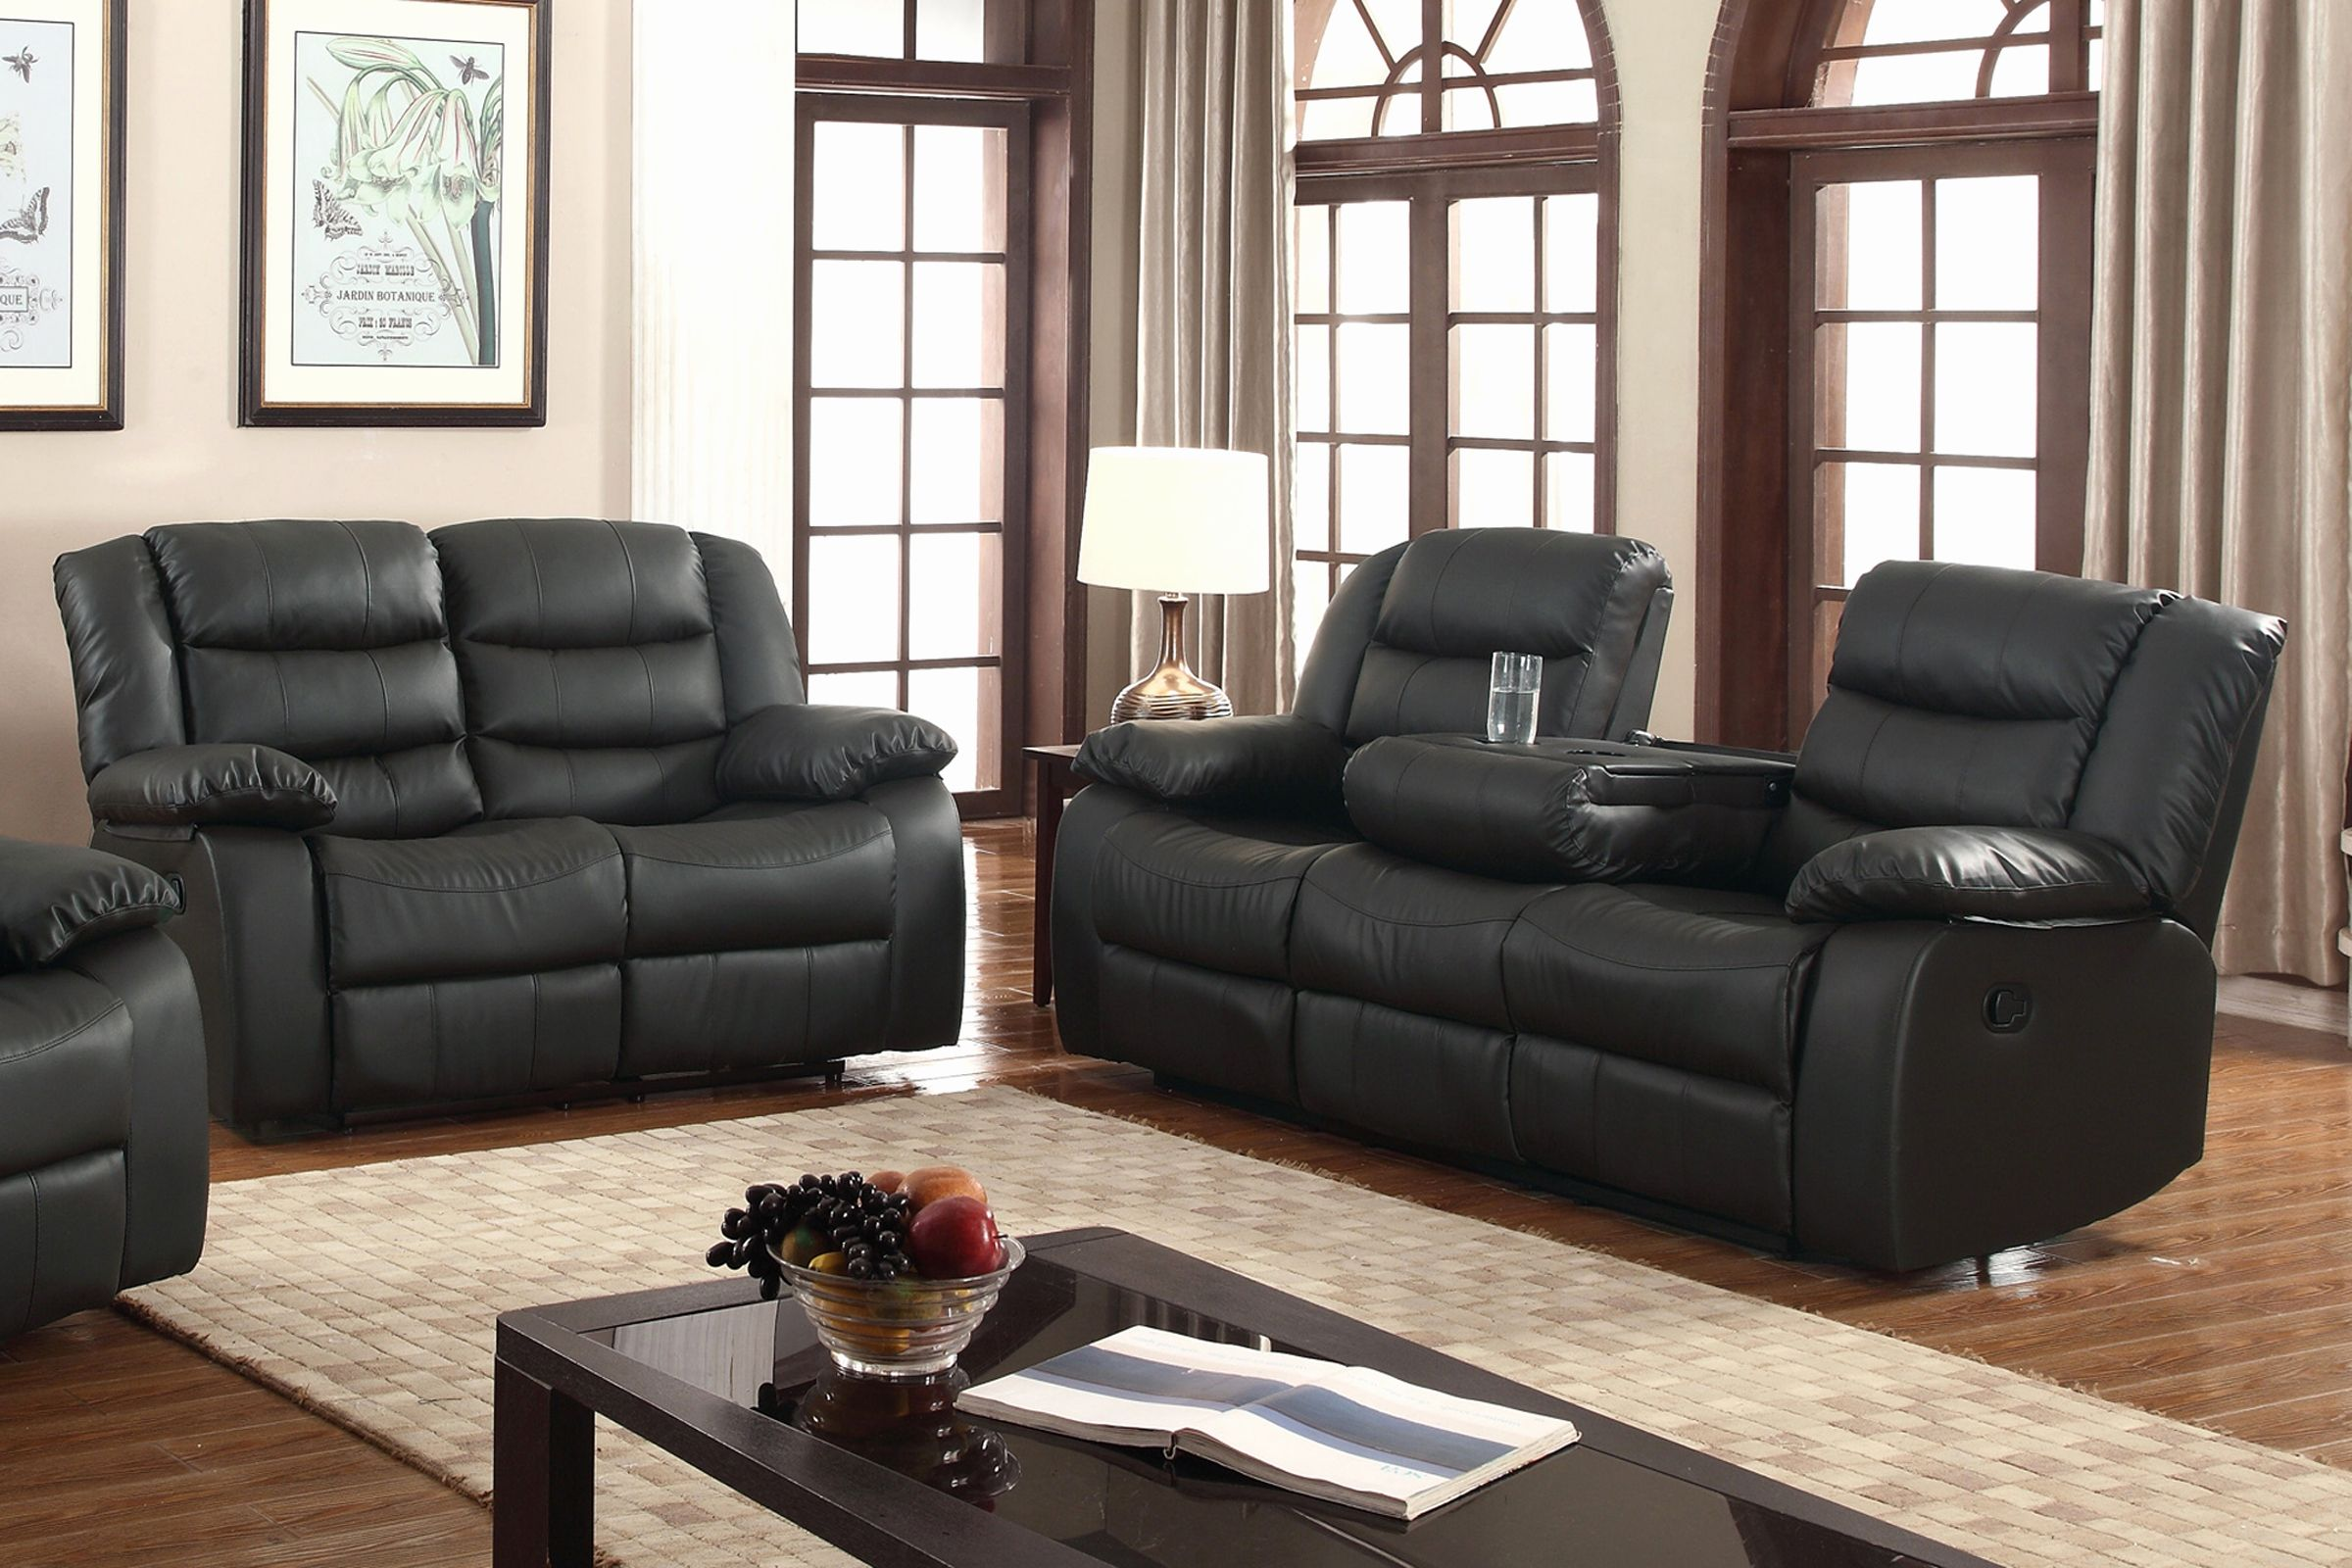 Nice Black Microfiber Sofa And Loveseat Set , Super Black Microfiber Sofa  And Loveseat Set 96